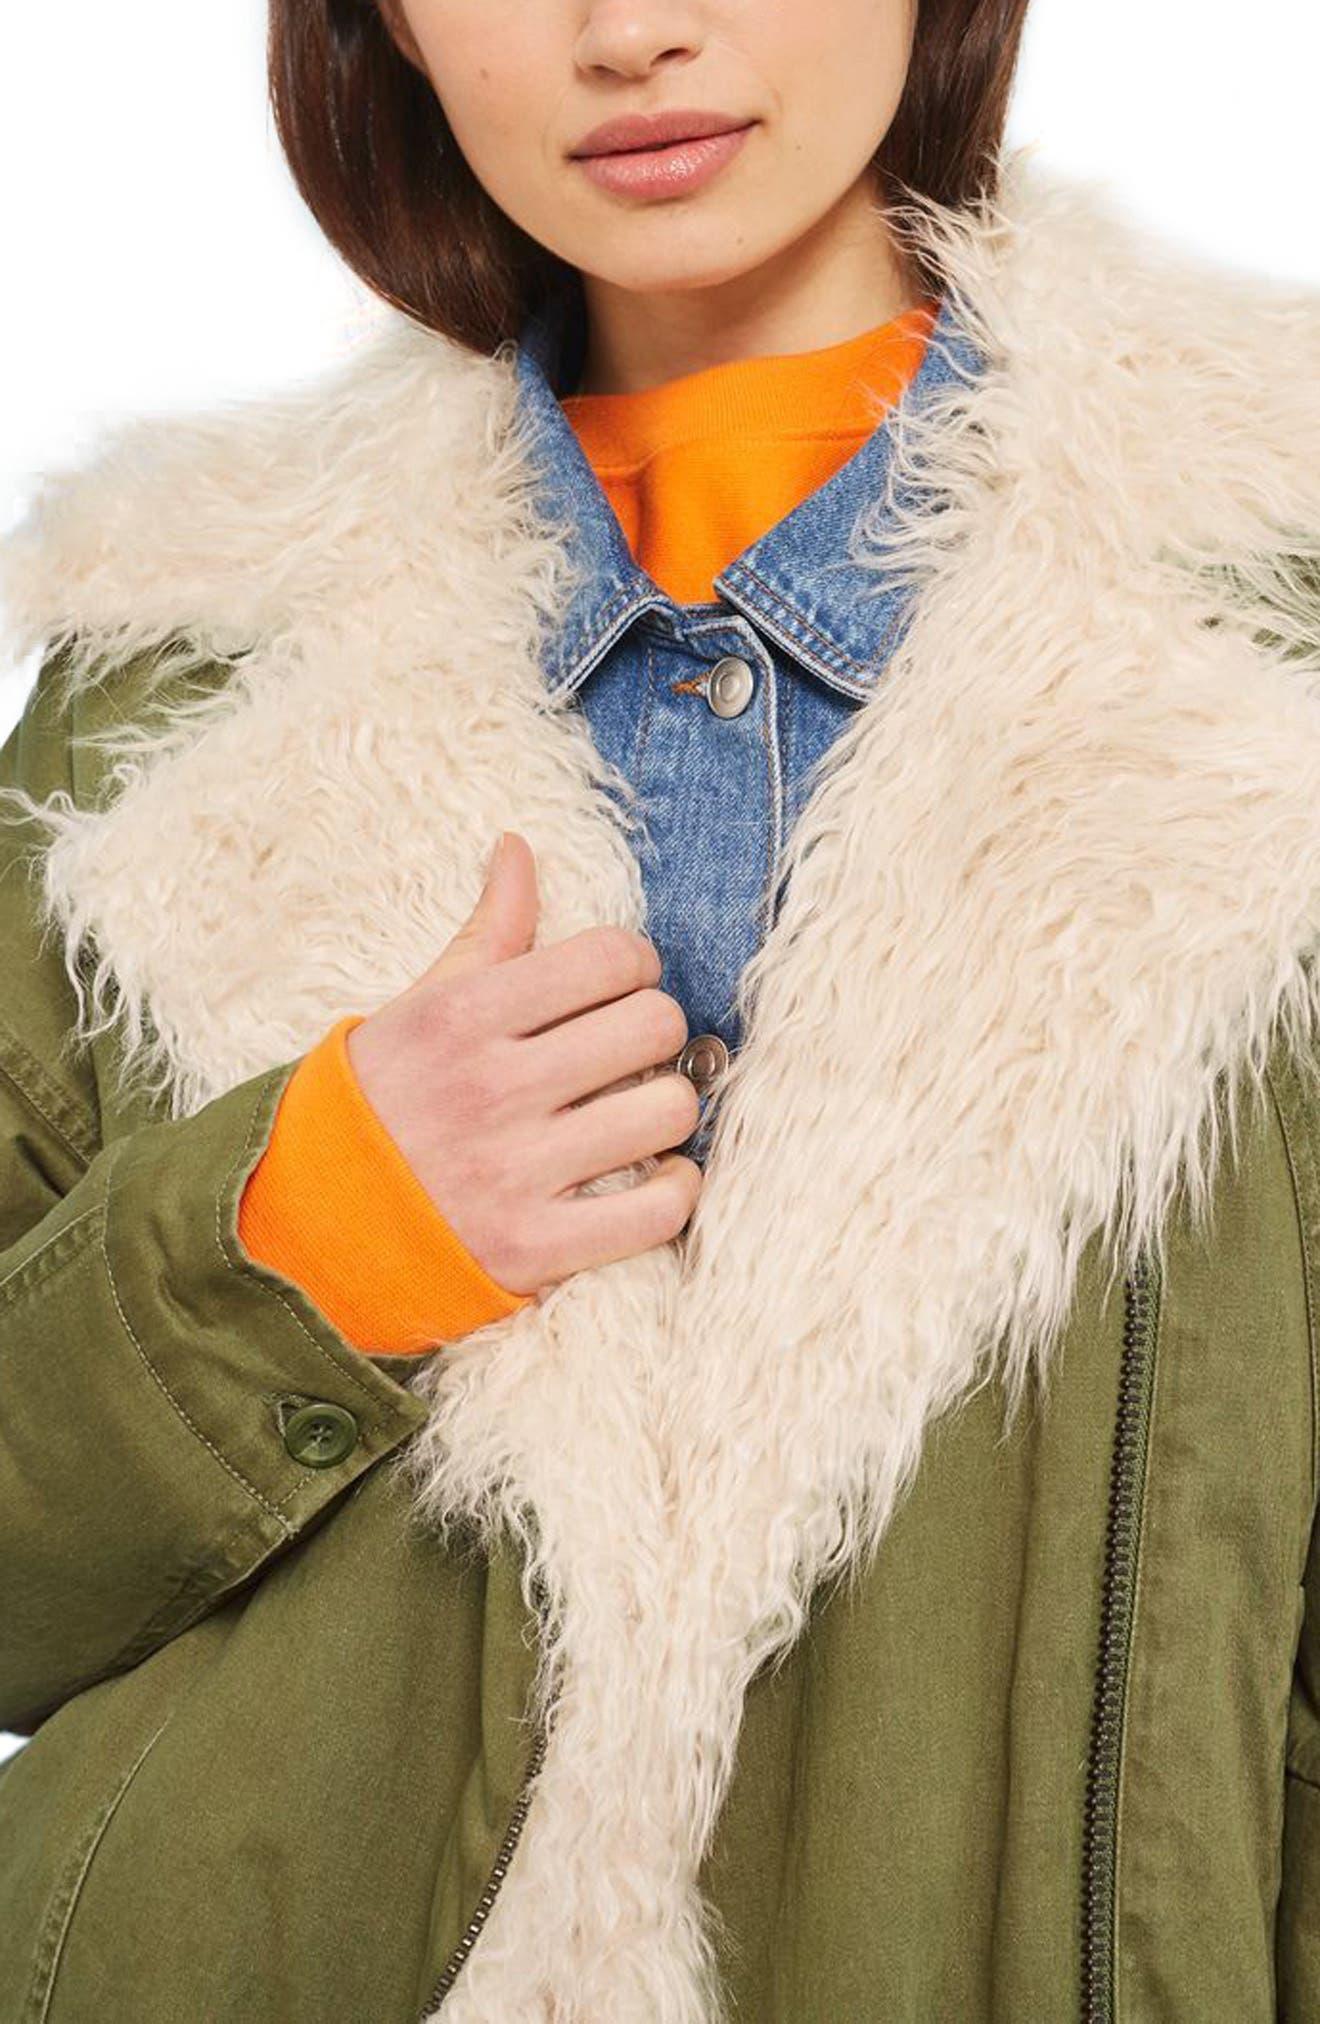 Jake Faux Fur Lined Jacket,                             Main thumbnail 1, color,                             300